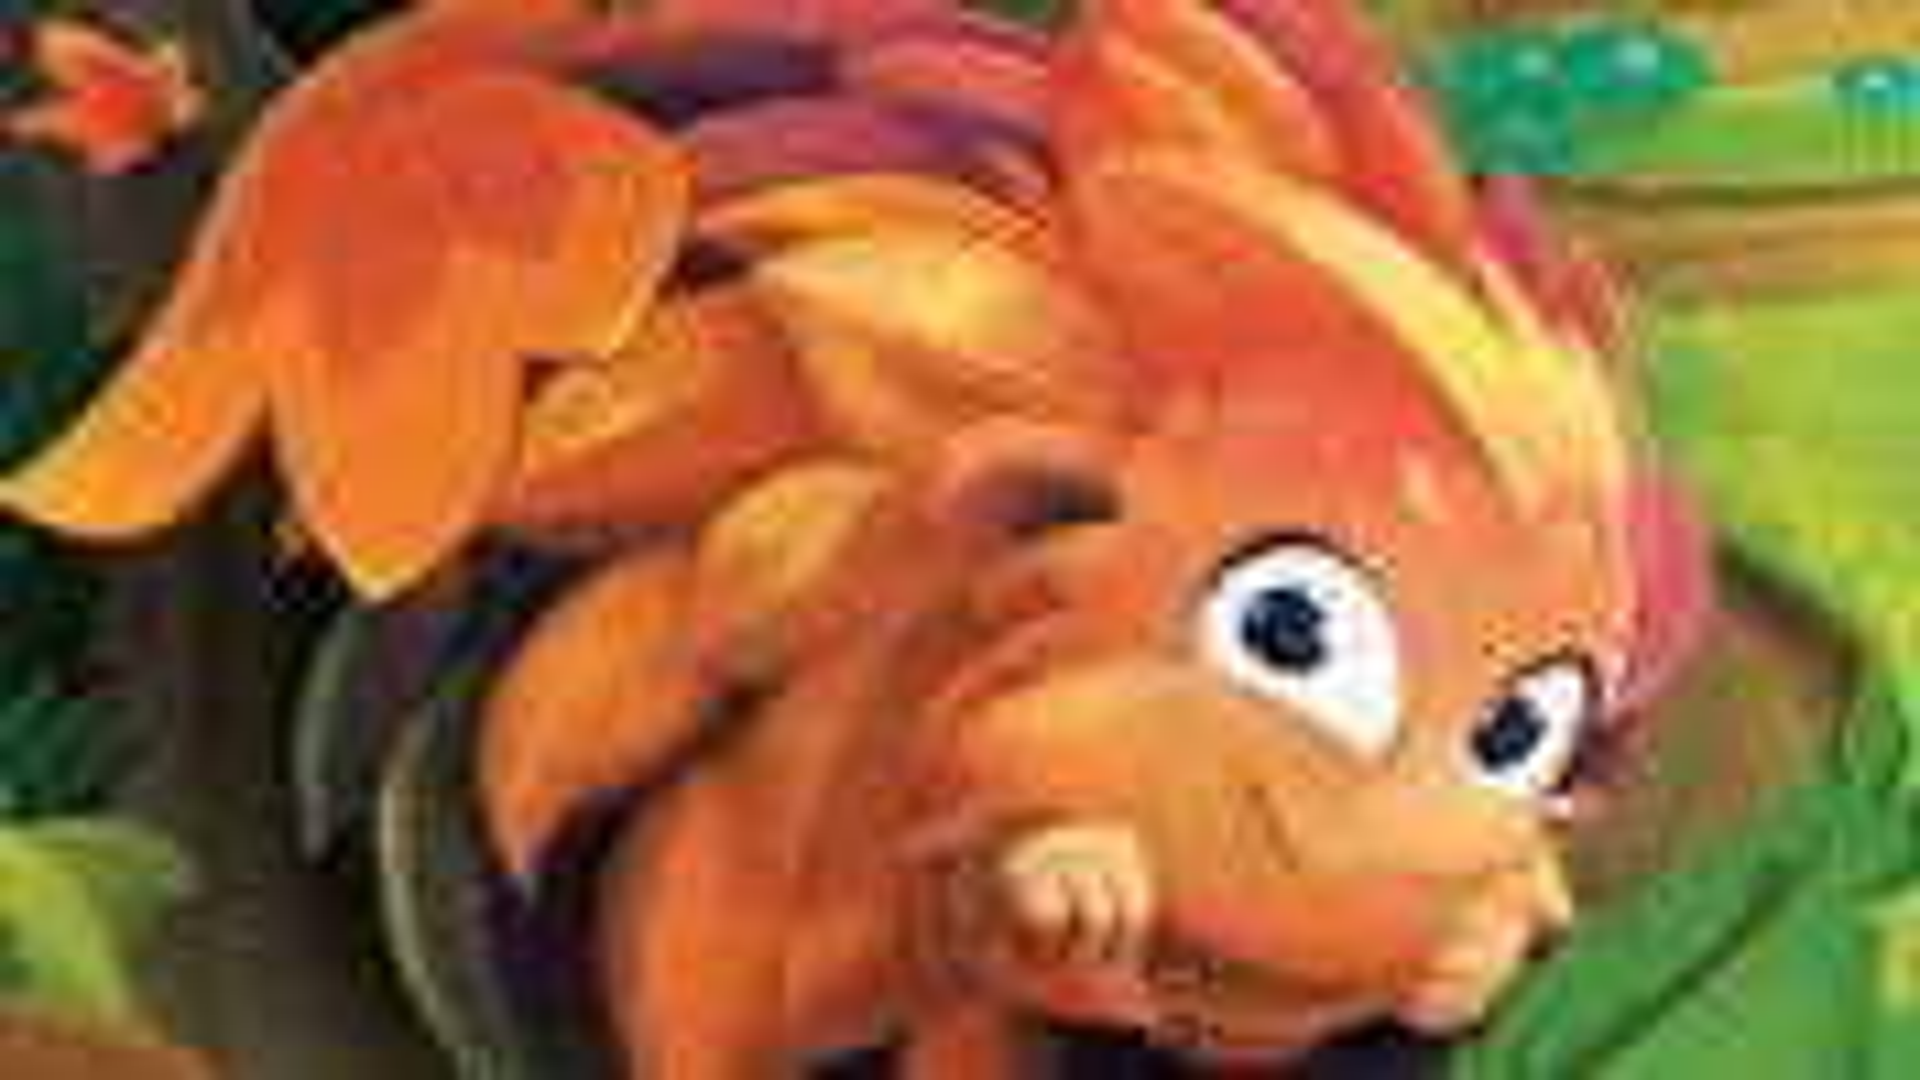 hedgehog-roll-board-game-cover-art.jpg